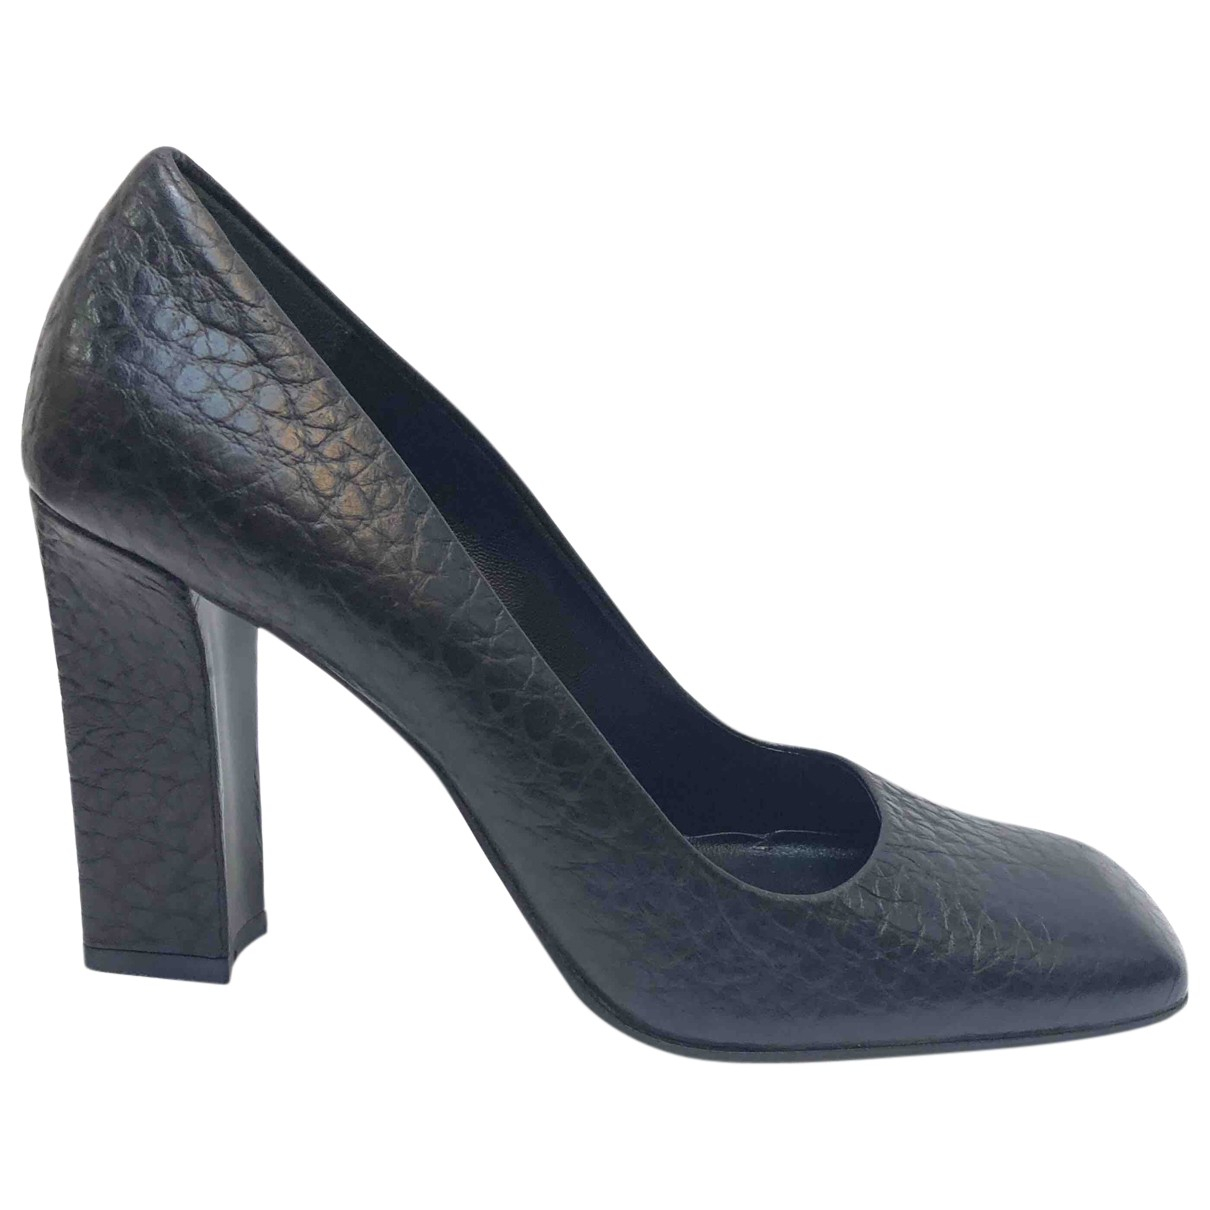 Prada N Black Leather Heels for Women 36 EU